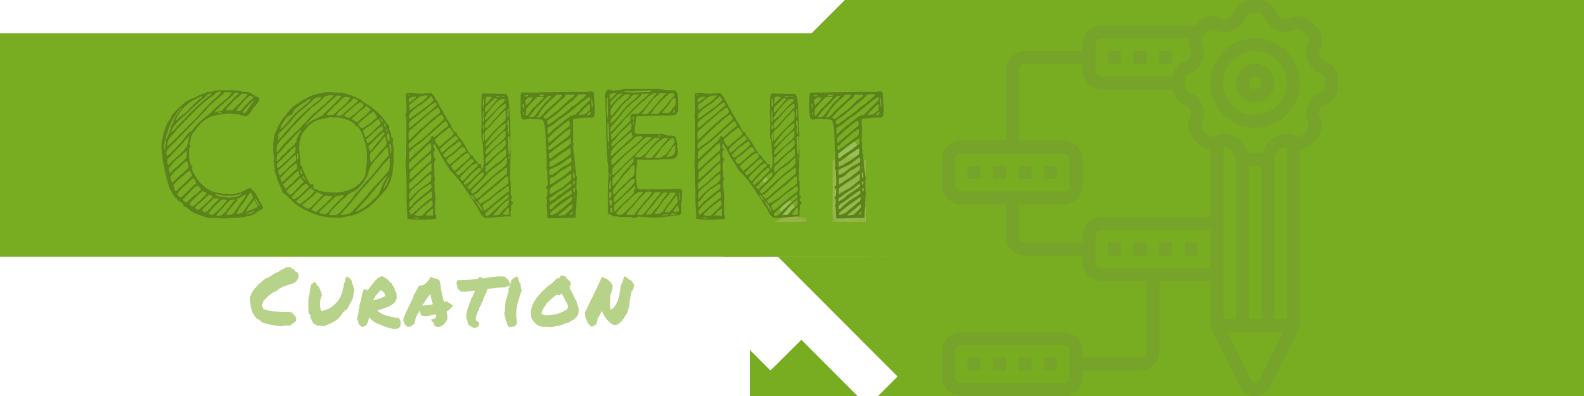 content curation Kurs